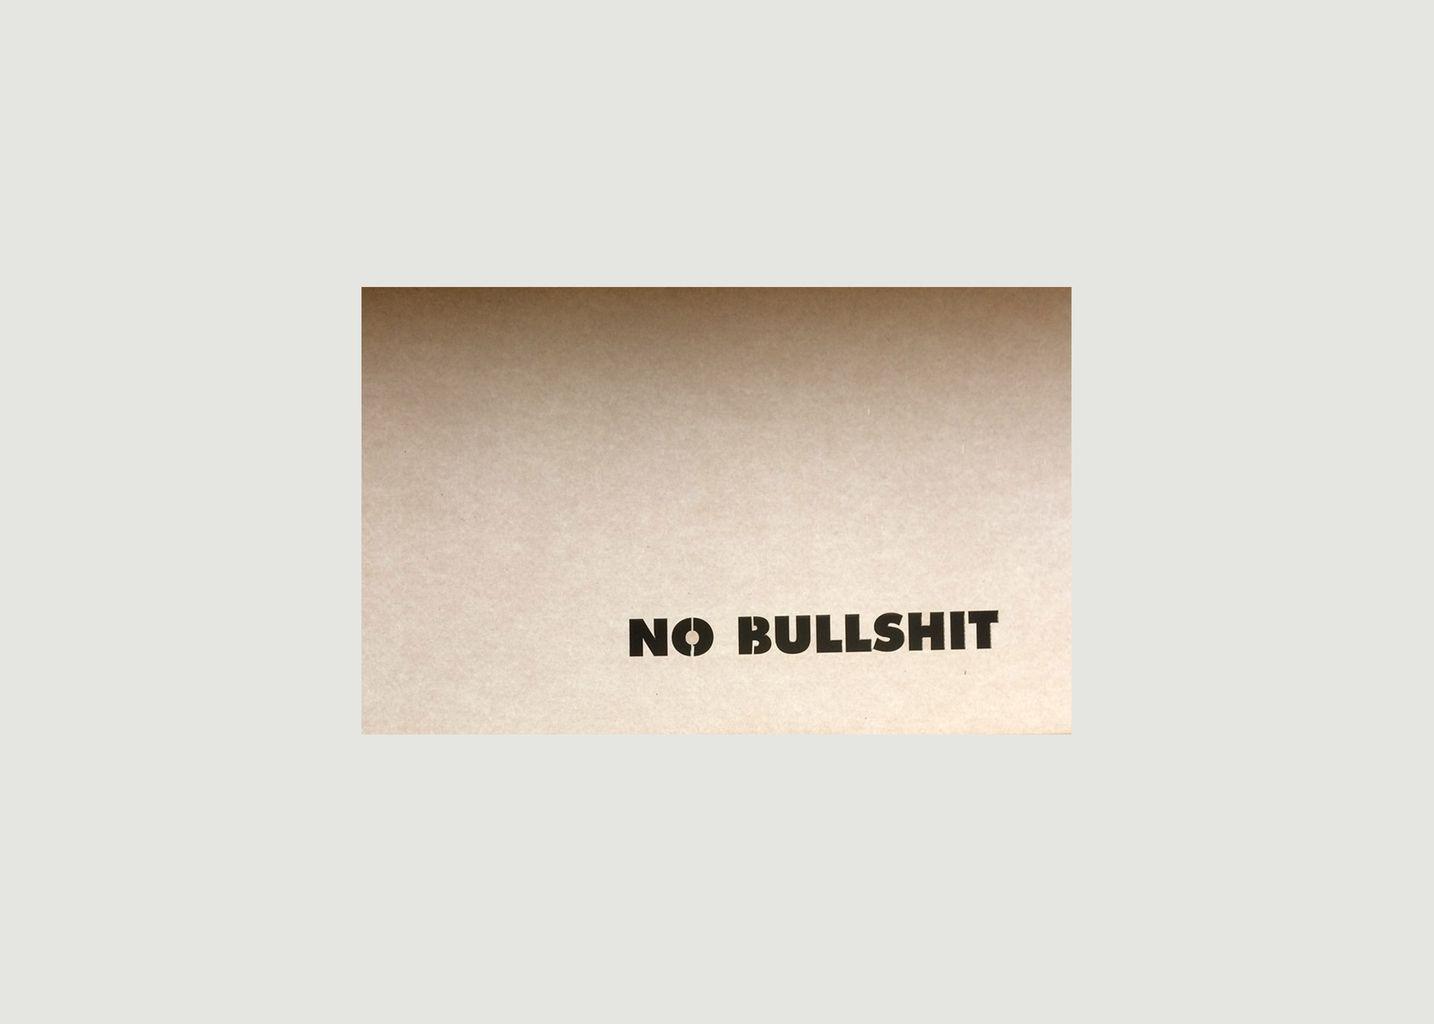 Coffret Box No Bullshit - Papette